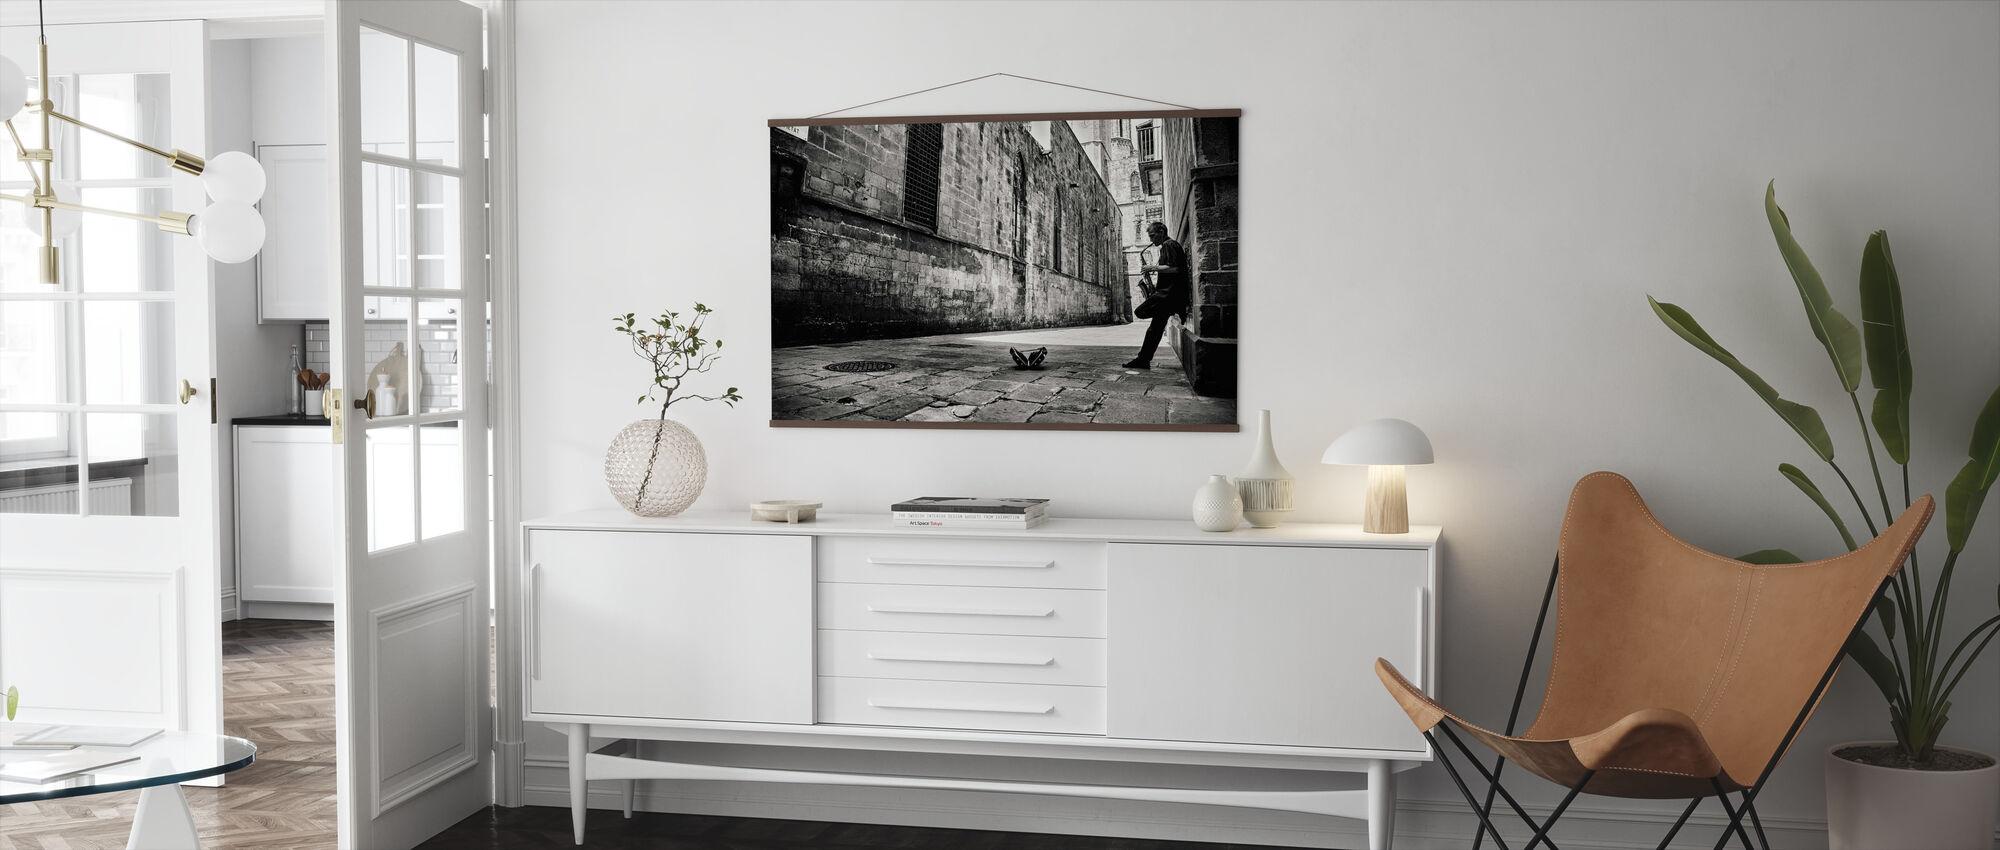 Silent Street, zwart-wit - Poster - Woonkamer